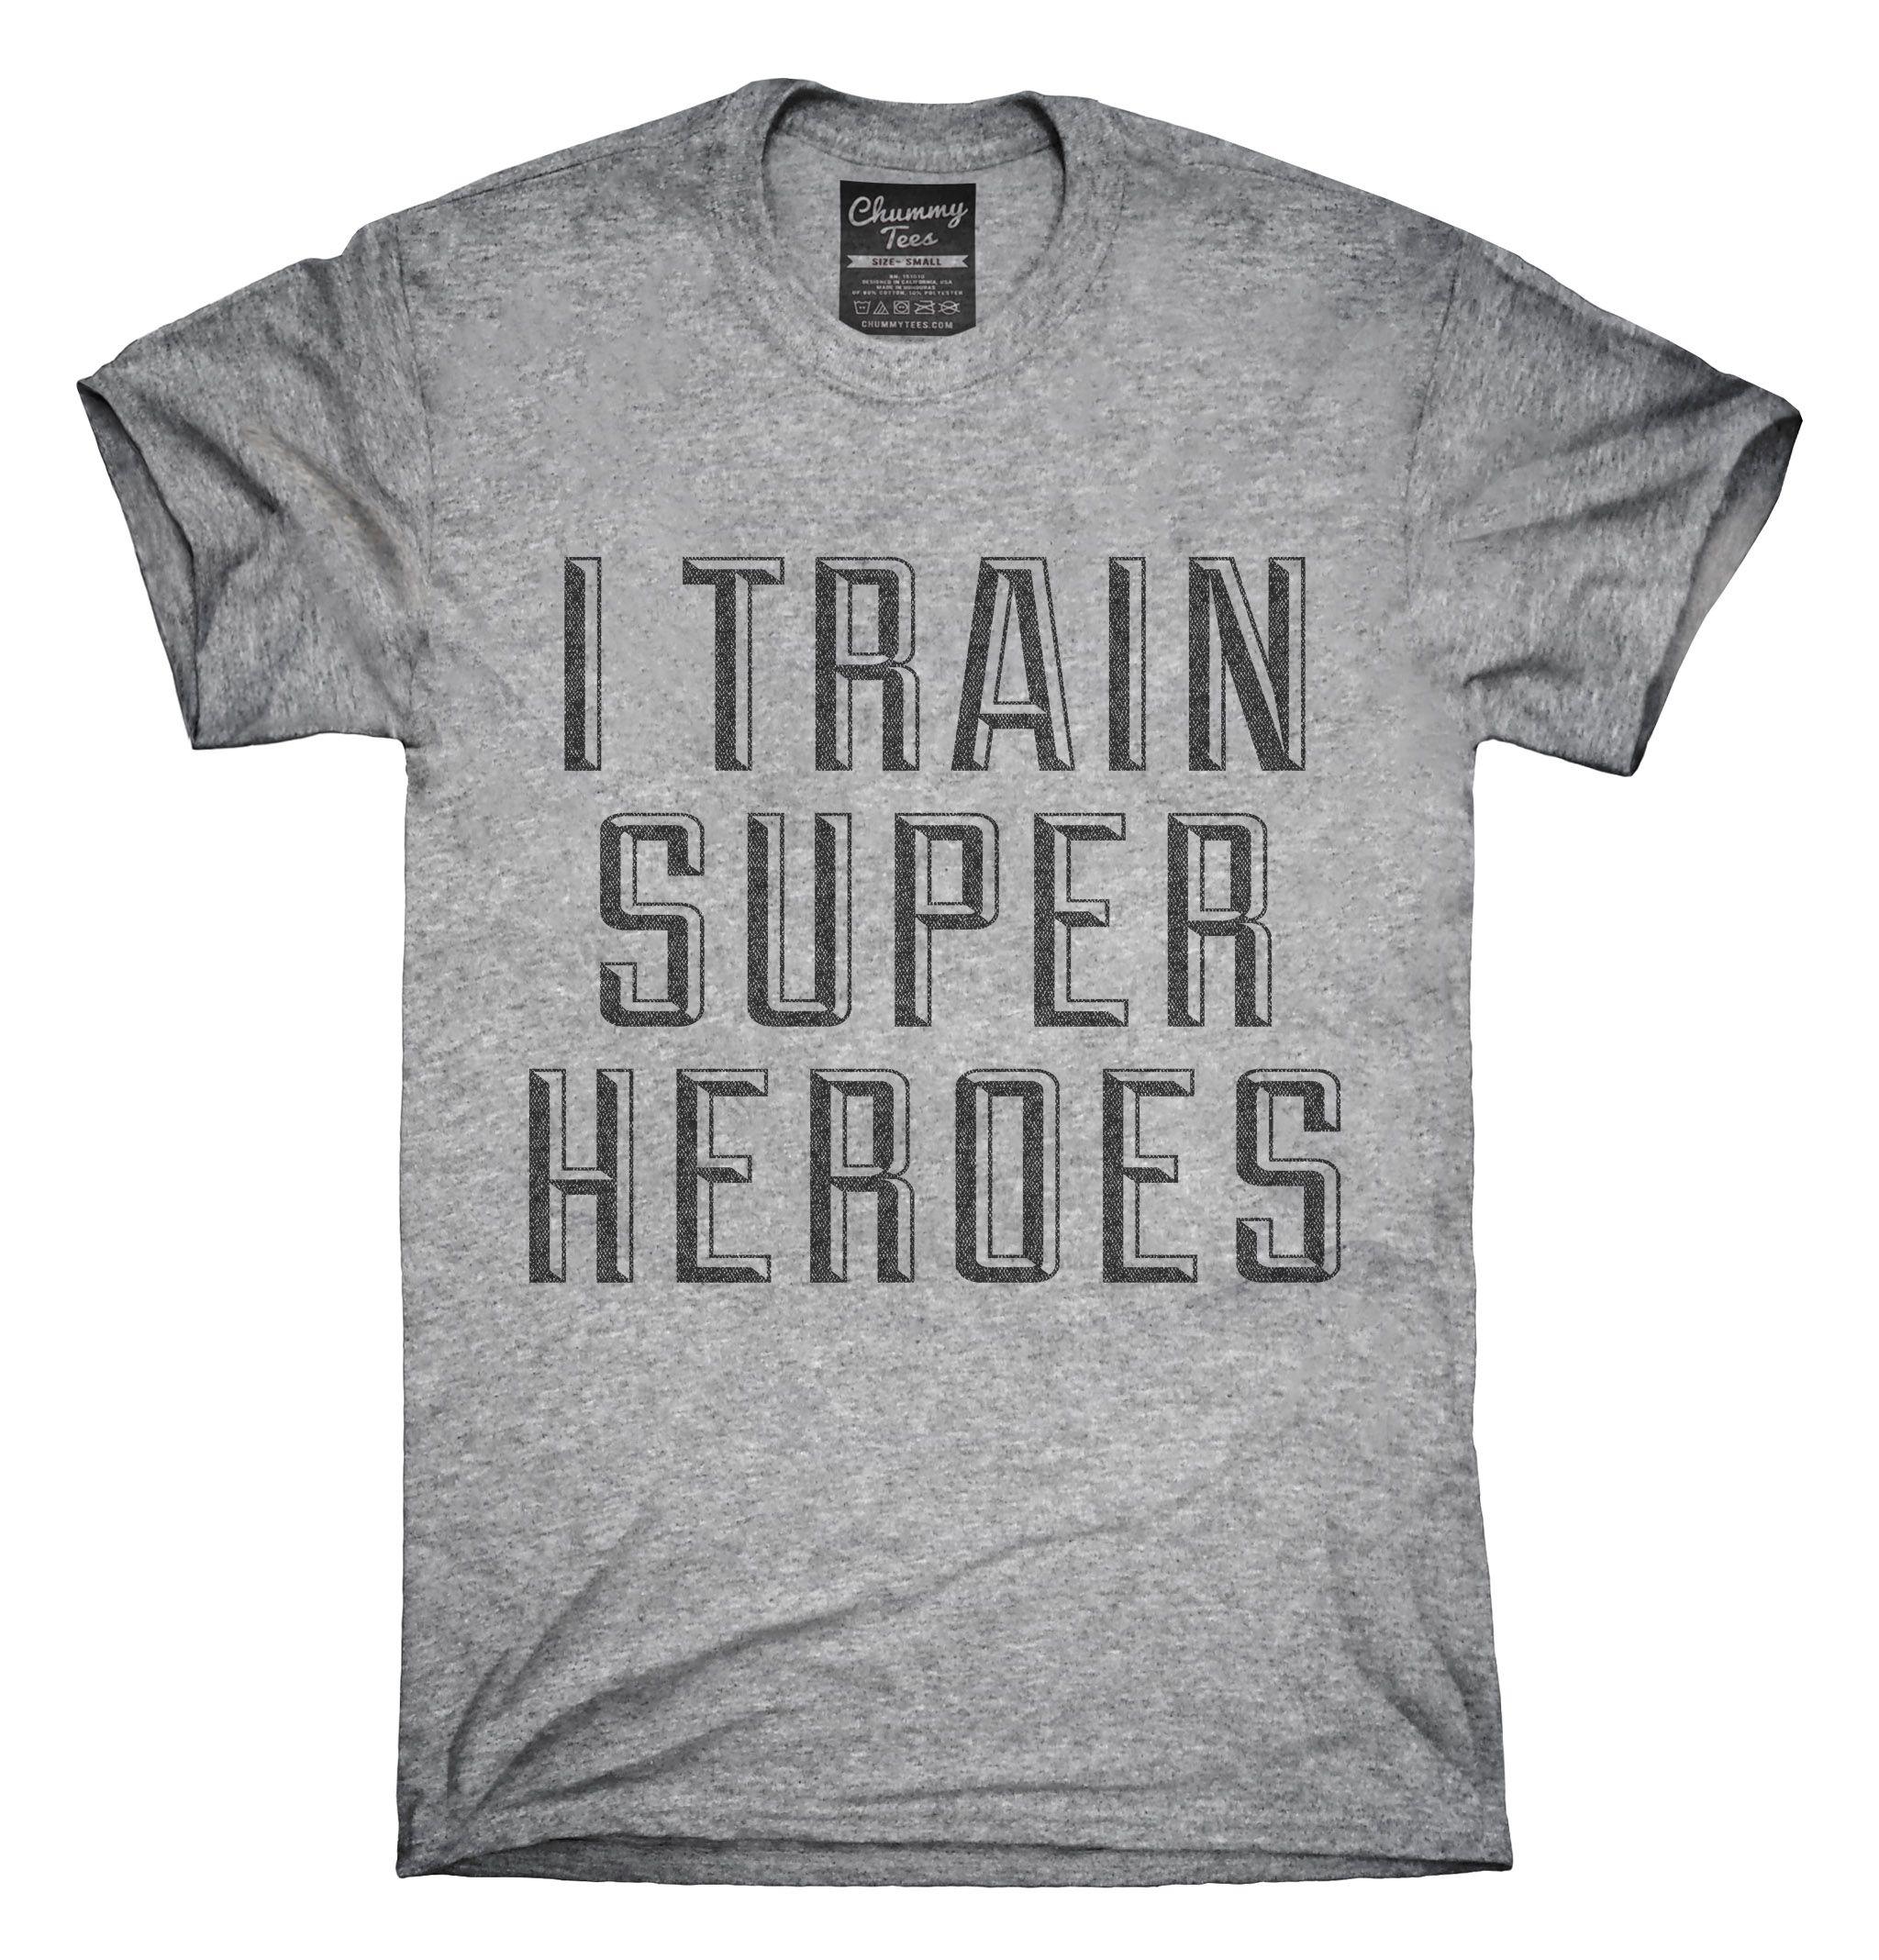 T shirt design ideas for schools - I Train Superheroes T Shirt Hoodie Tank Top Superhero Ideassuperhero Classroomsuperhero Partyschool